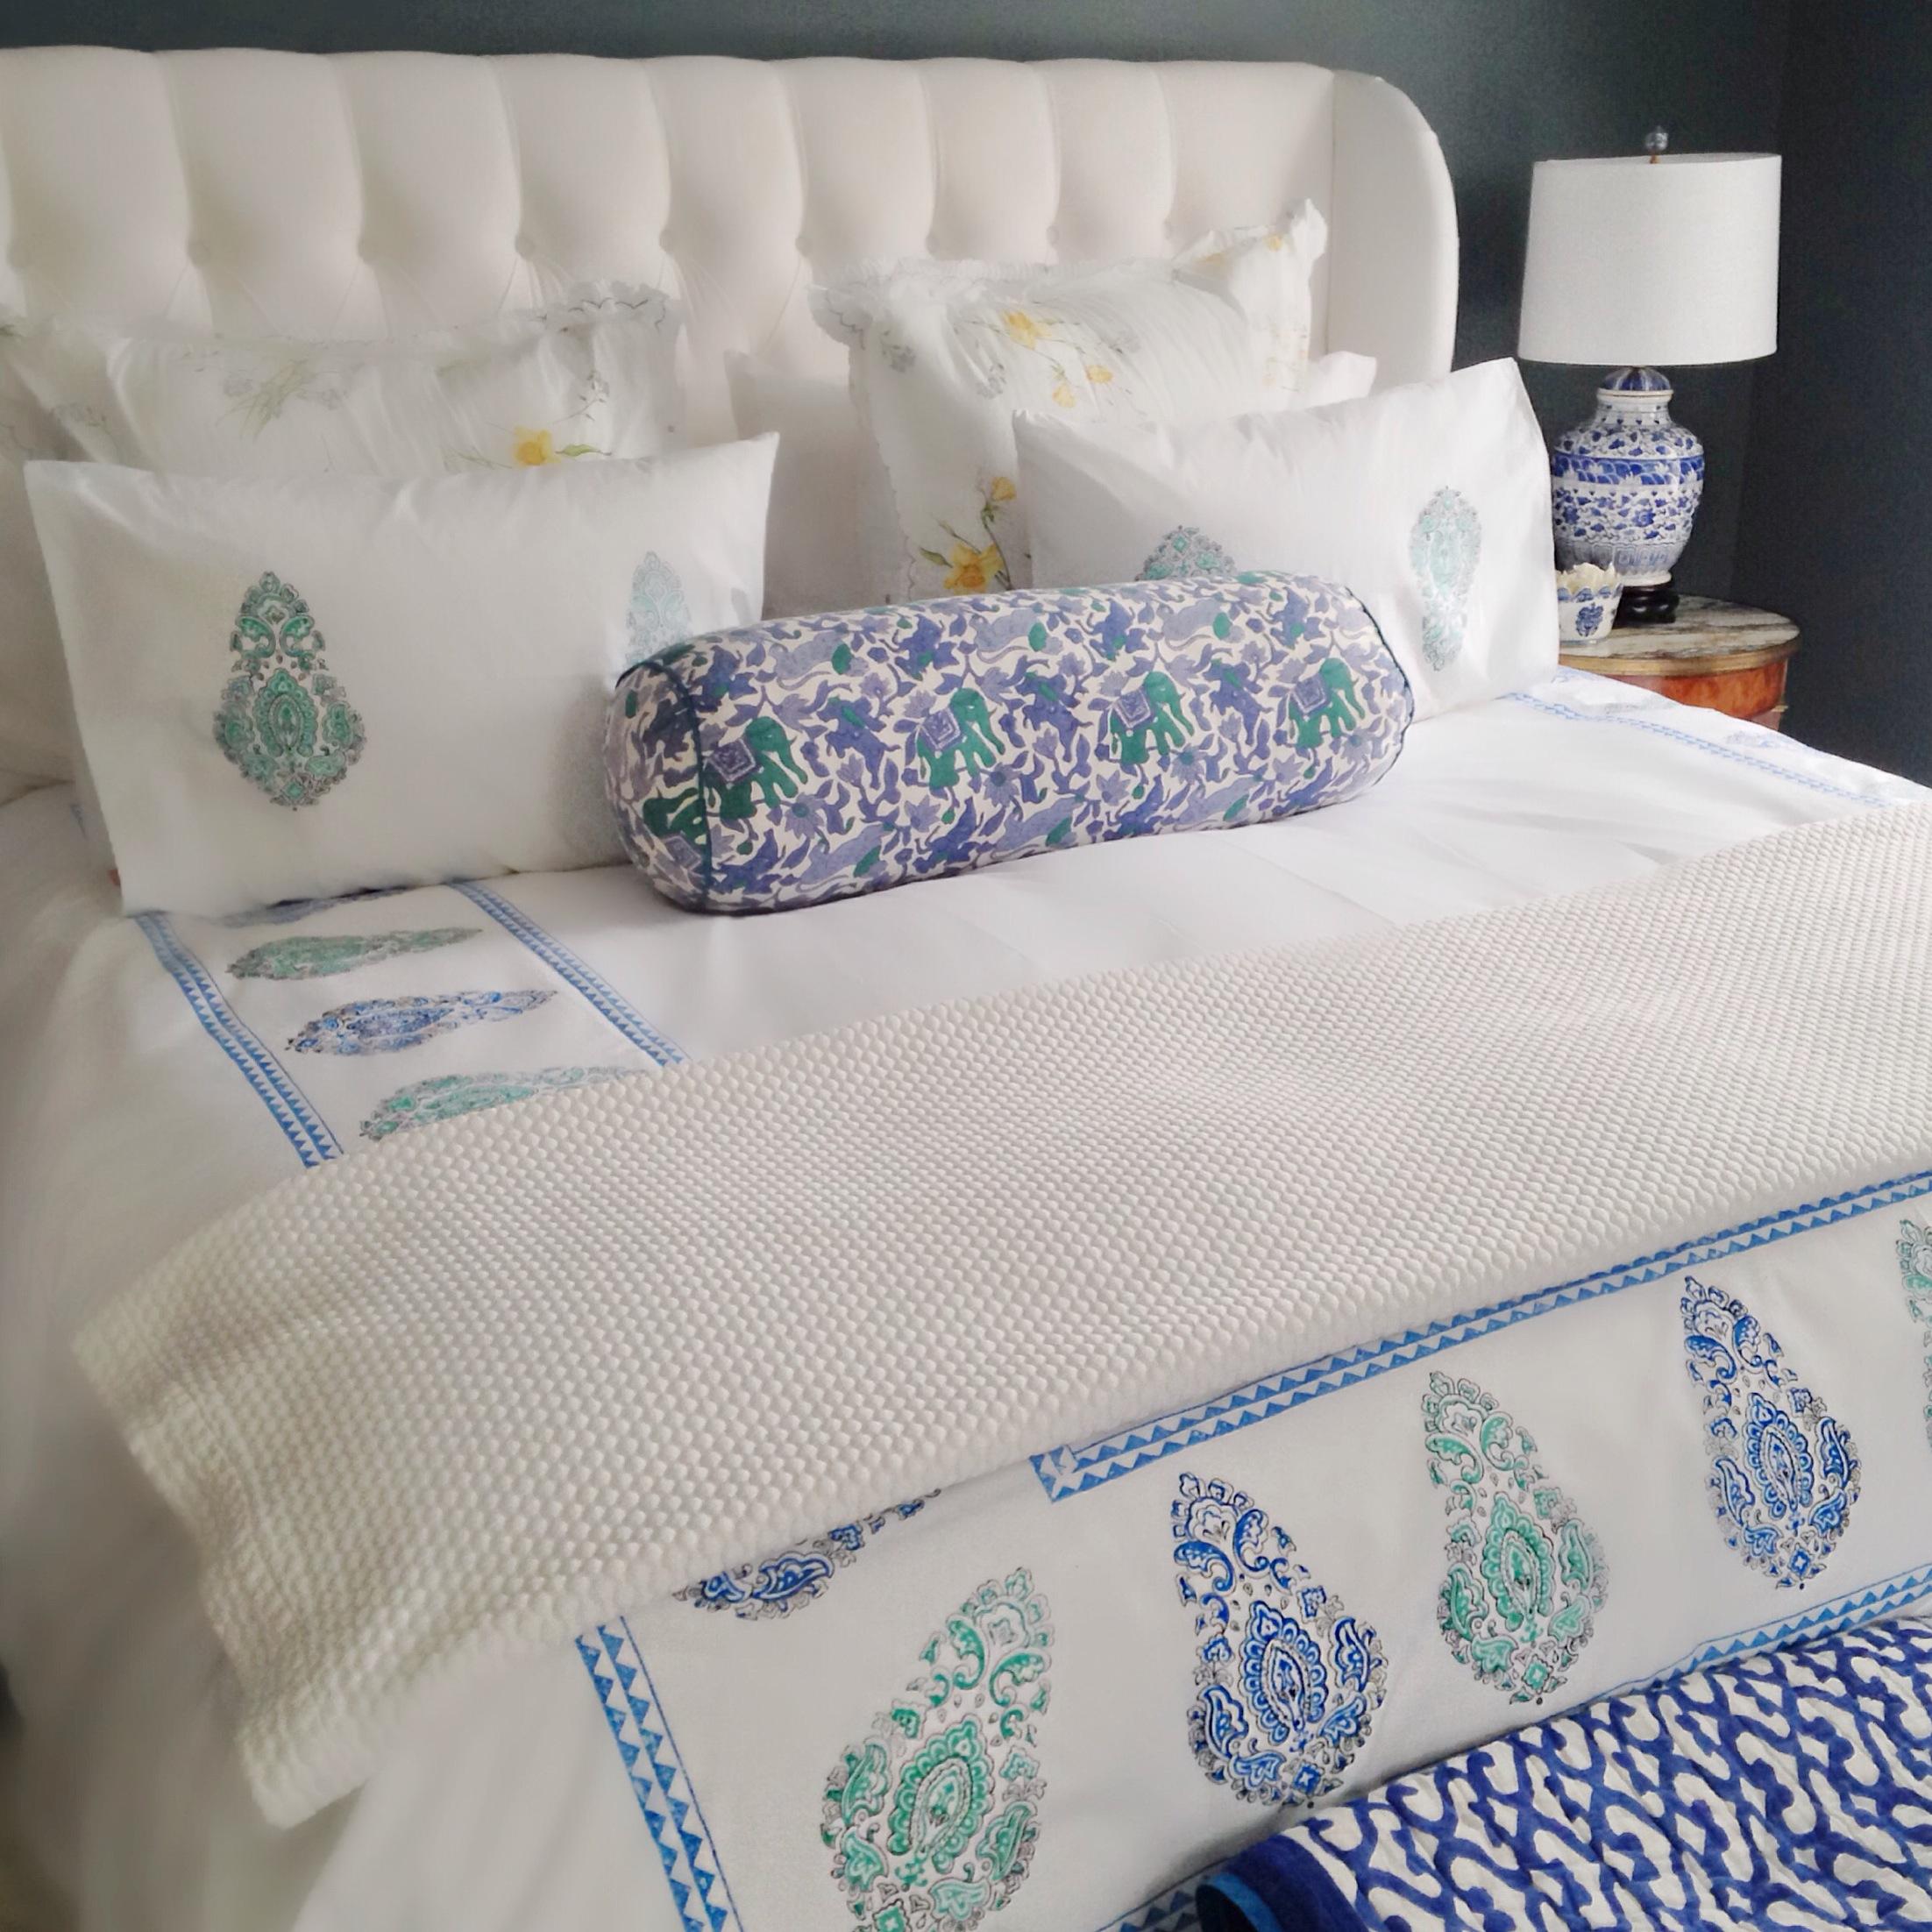 throw pillow p diwan decorative pillows robshaw jr john am bed htm bedding